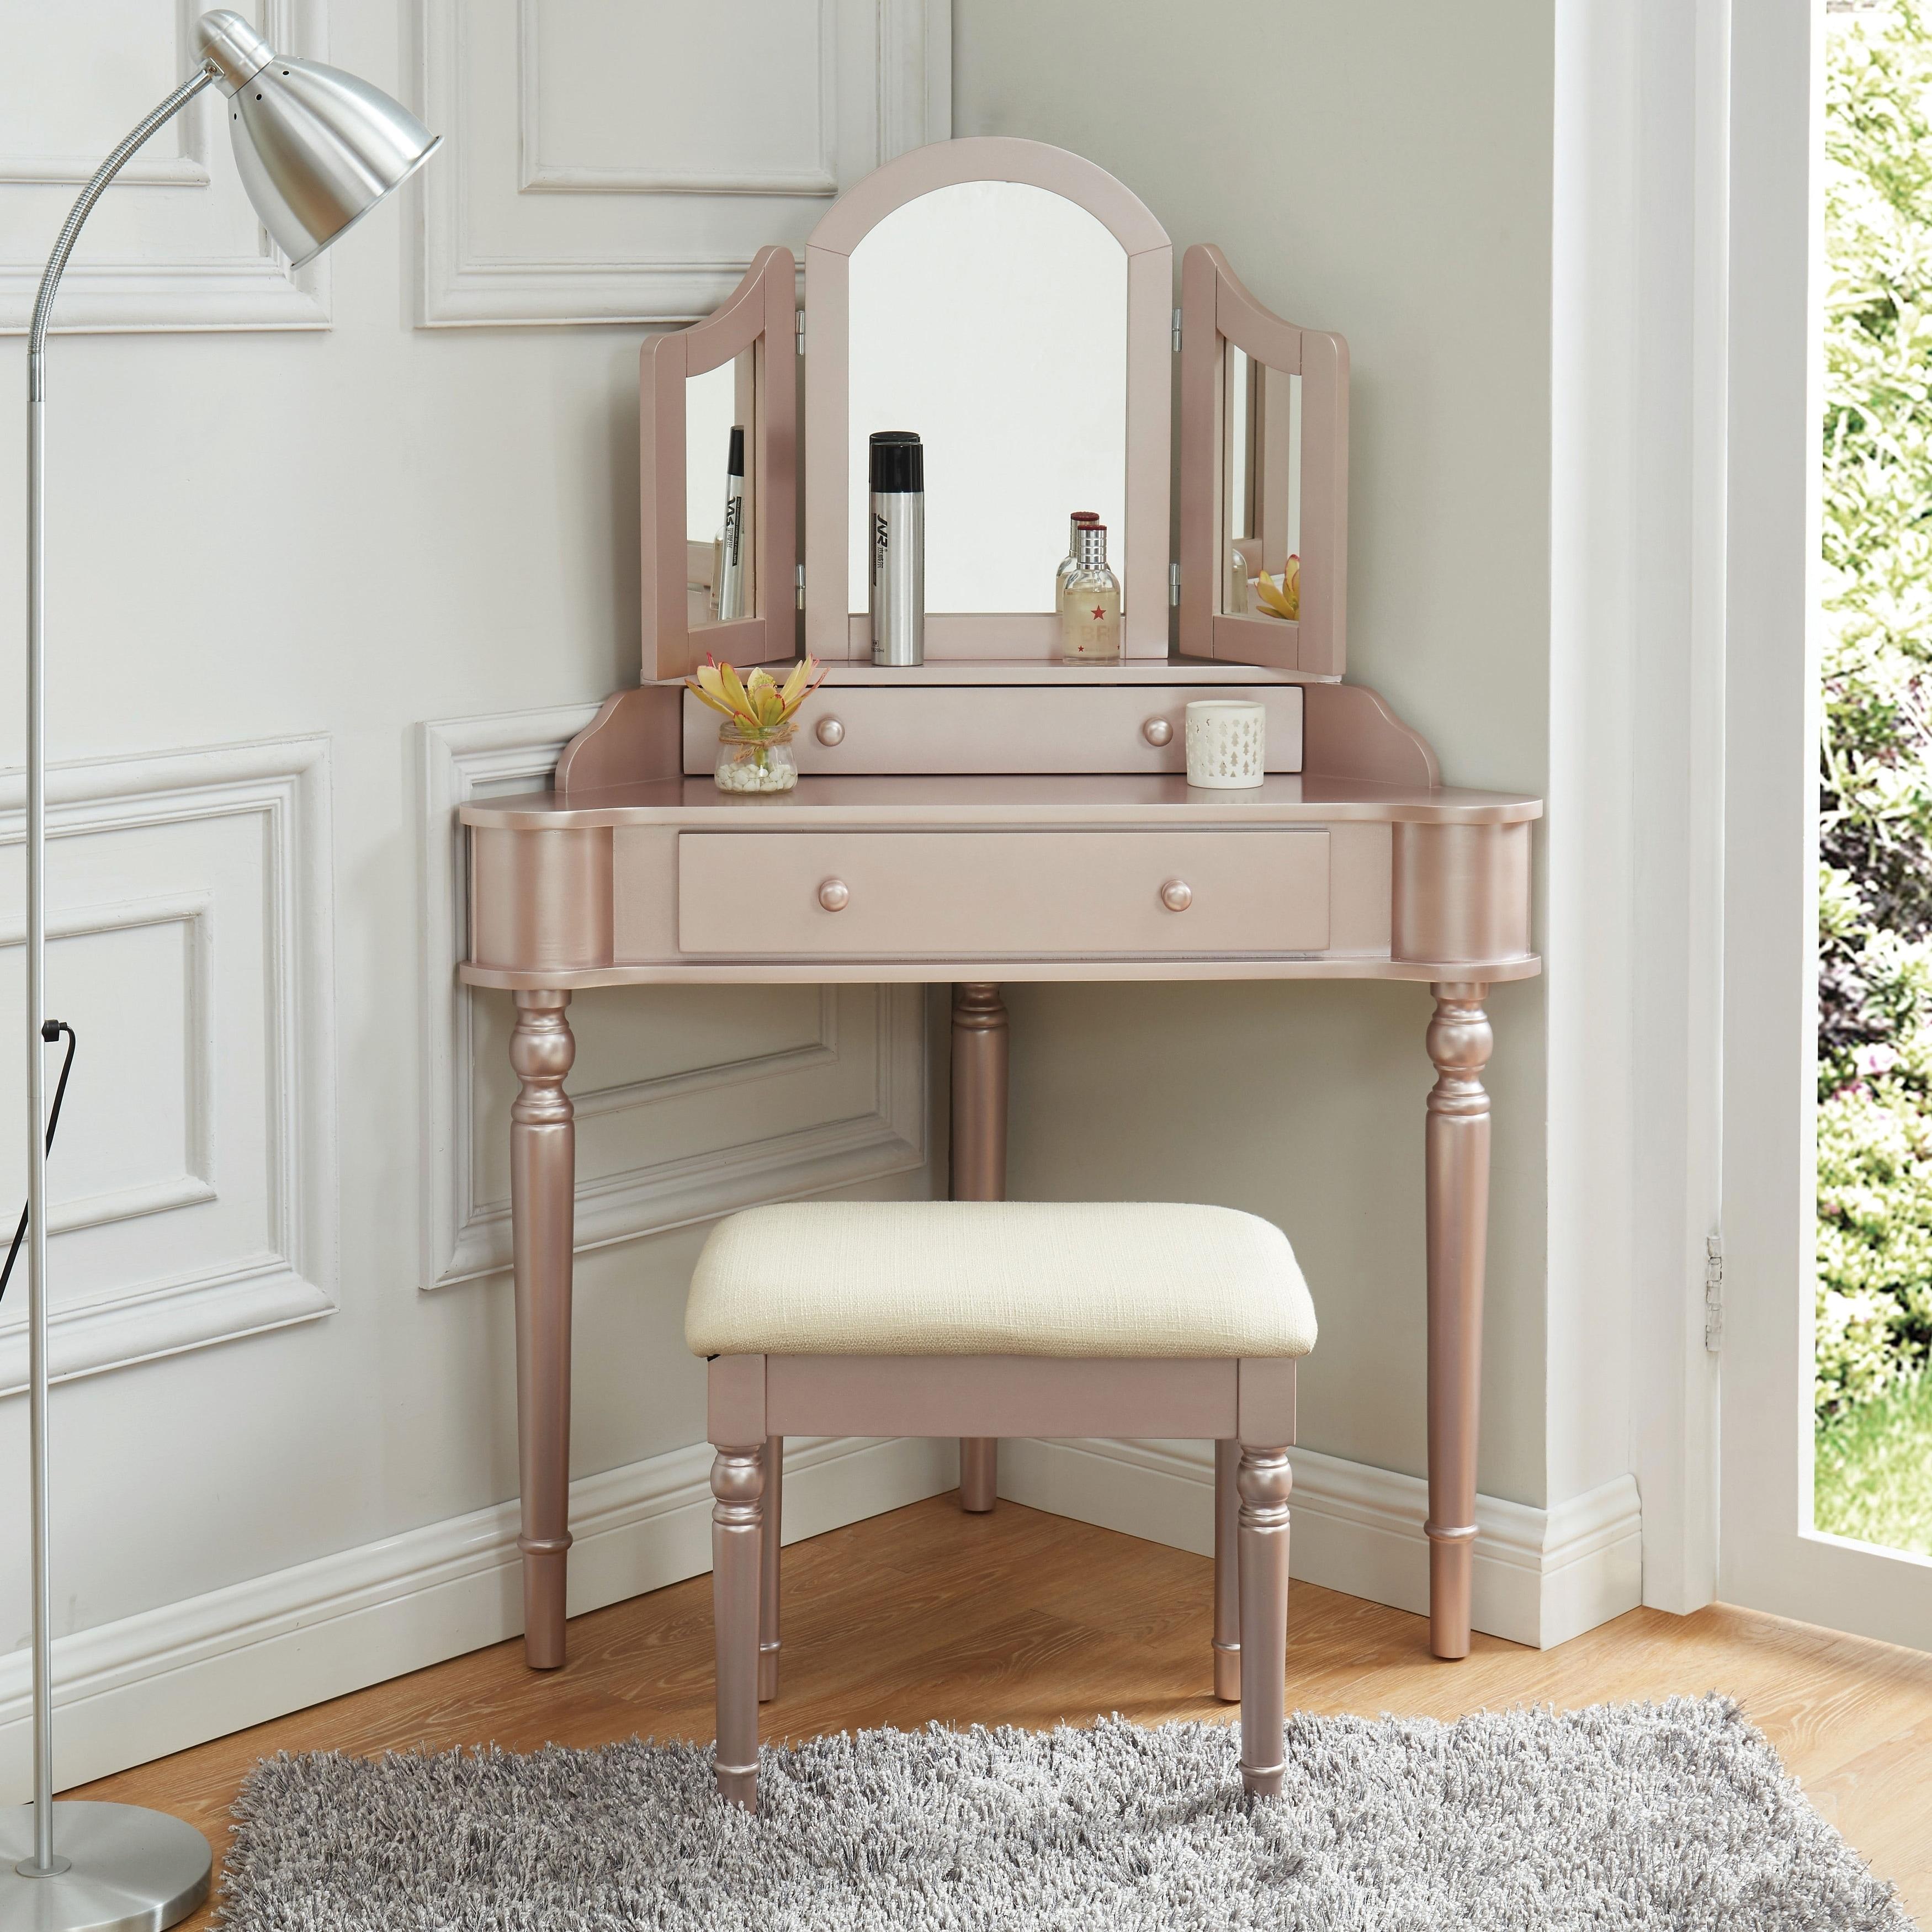 competitive price 50e2f 0e098 Gracewood Hollow Kresev 3-piece Corner Vanity Set